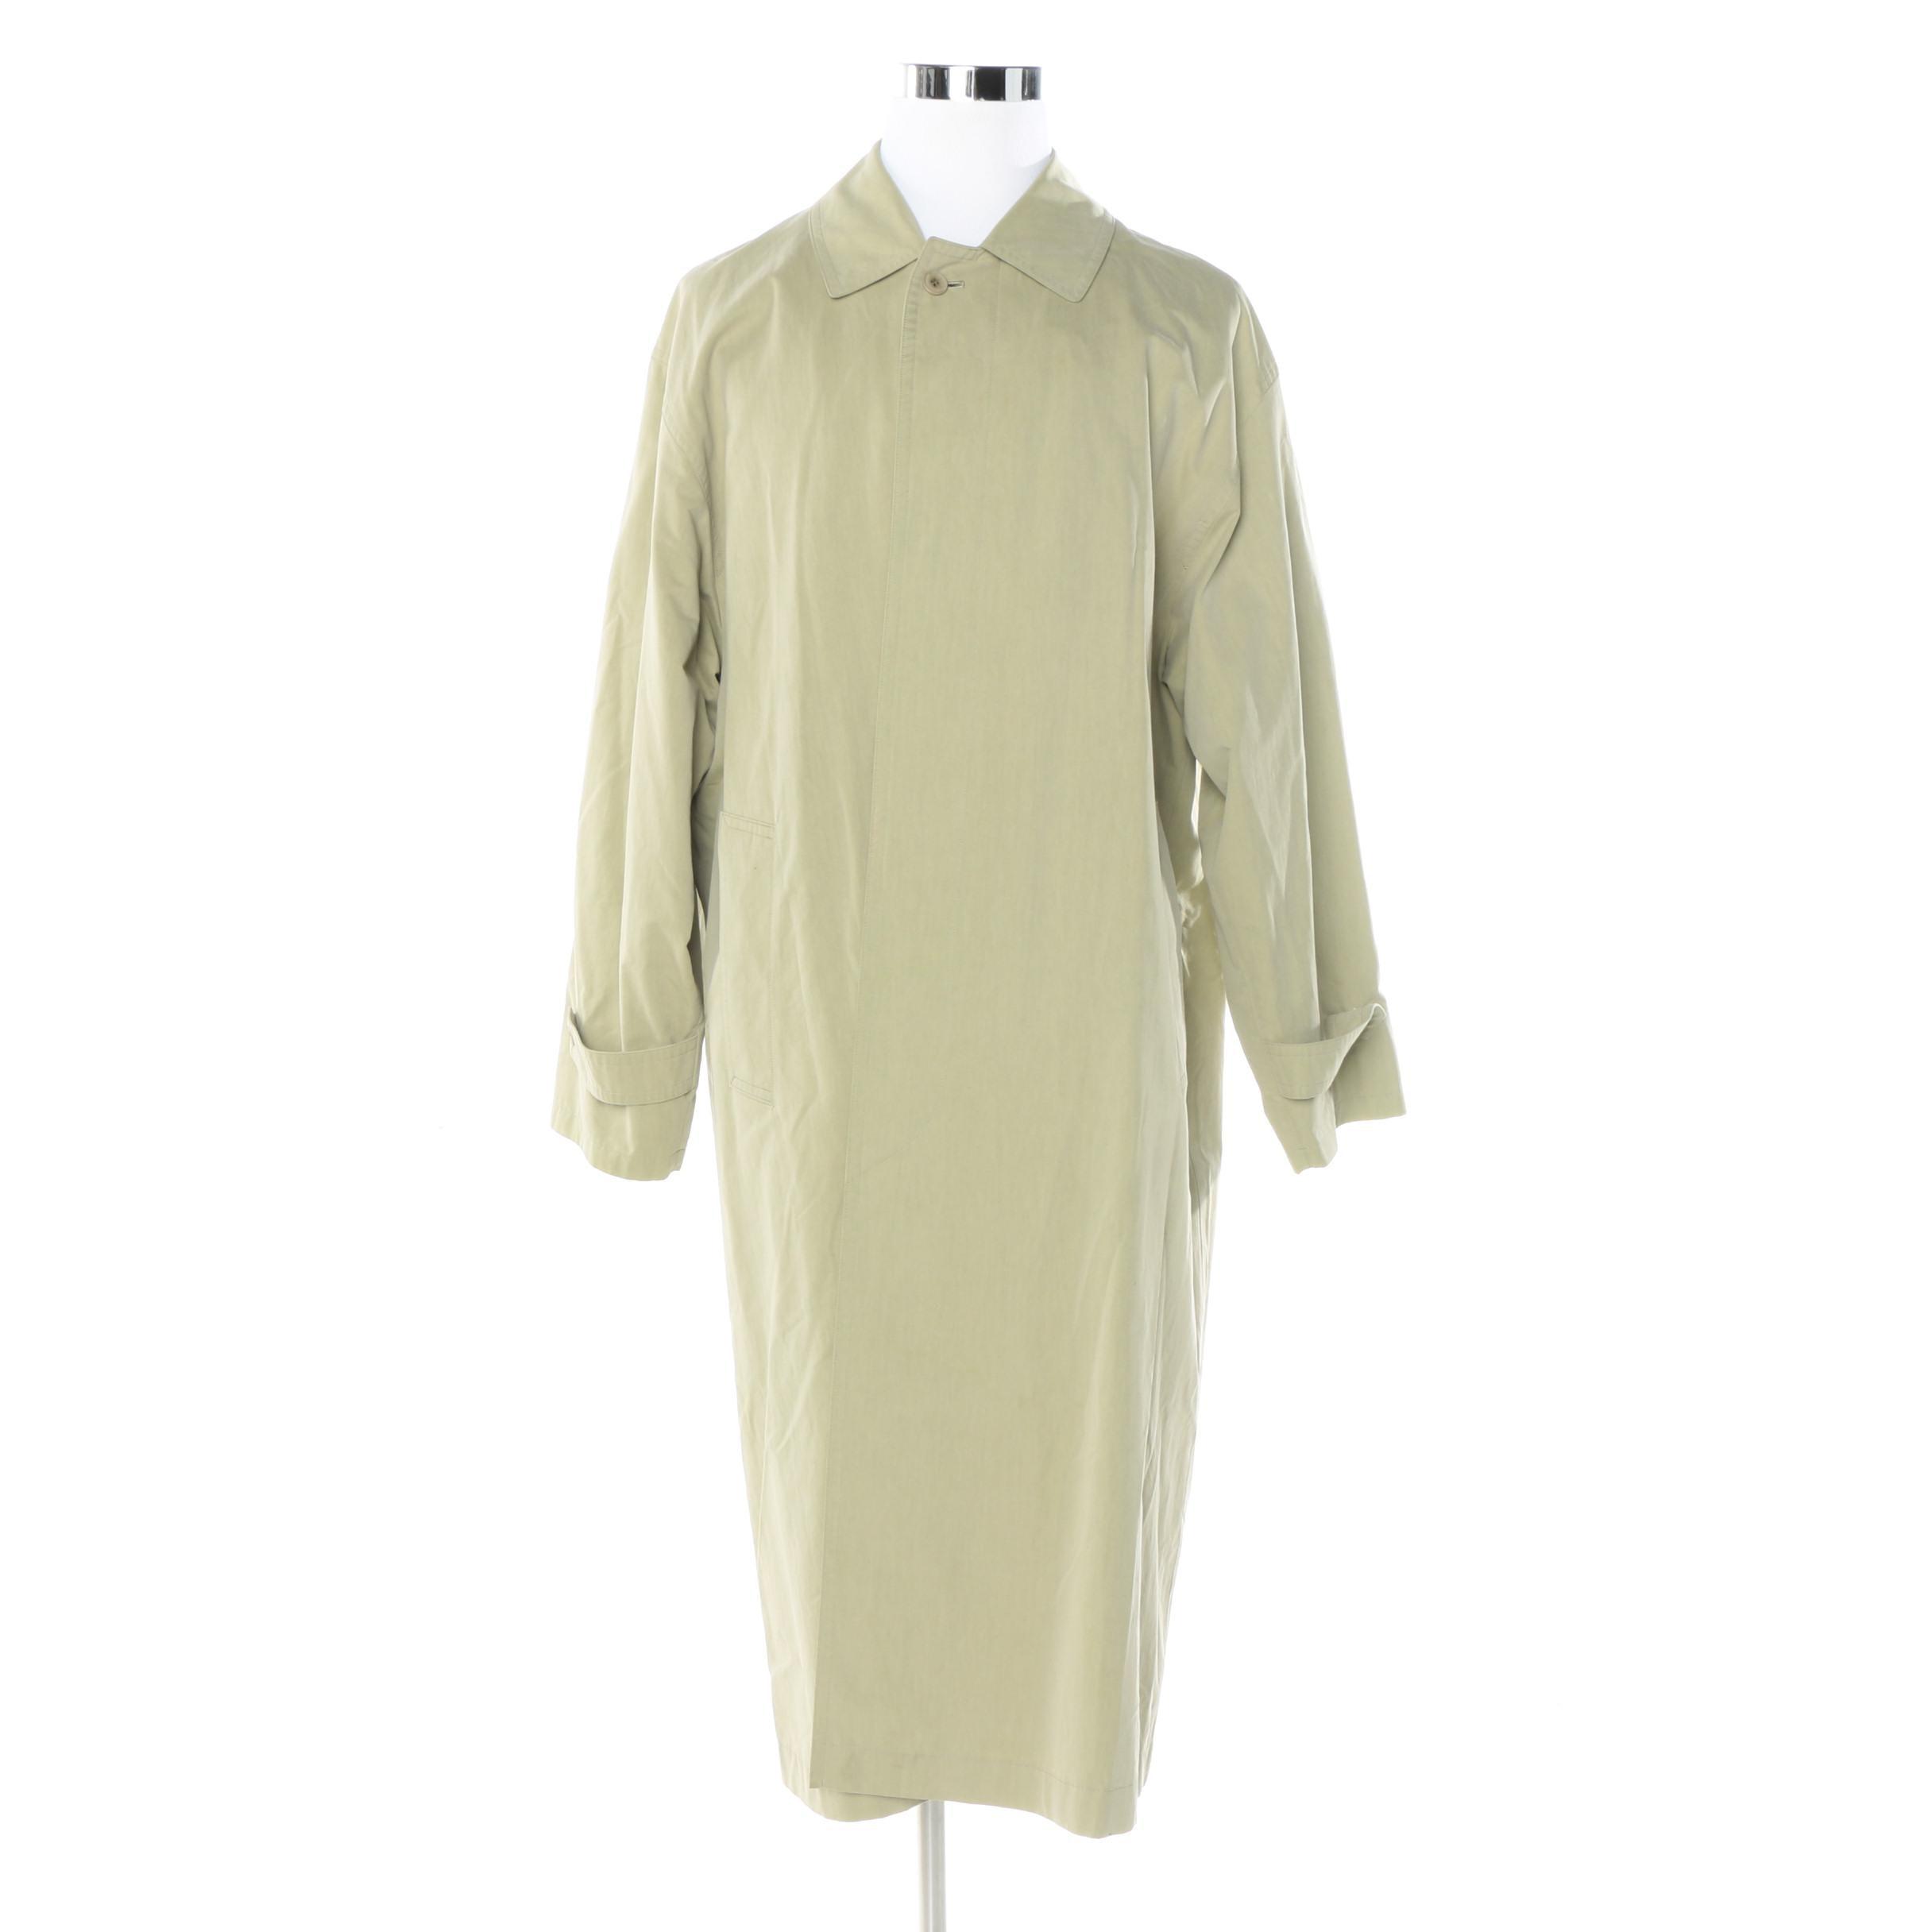 Men's Burberry Prorsum Collection Trench Coat